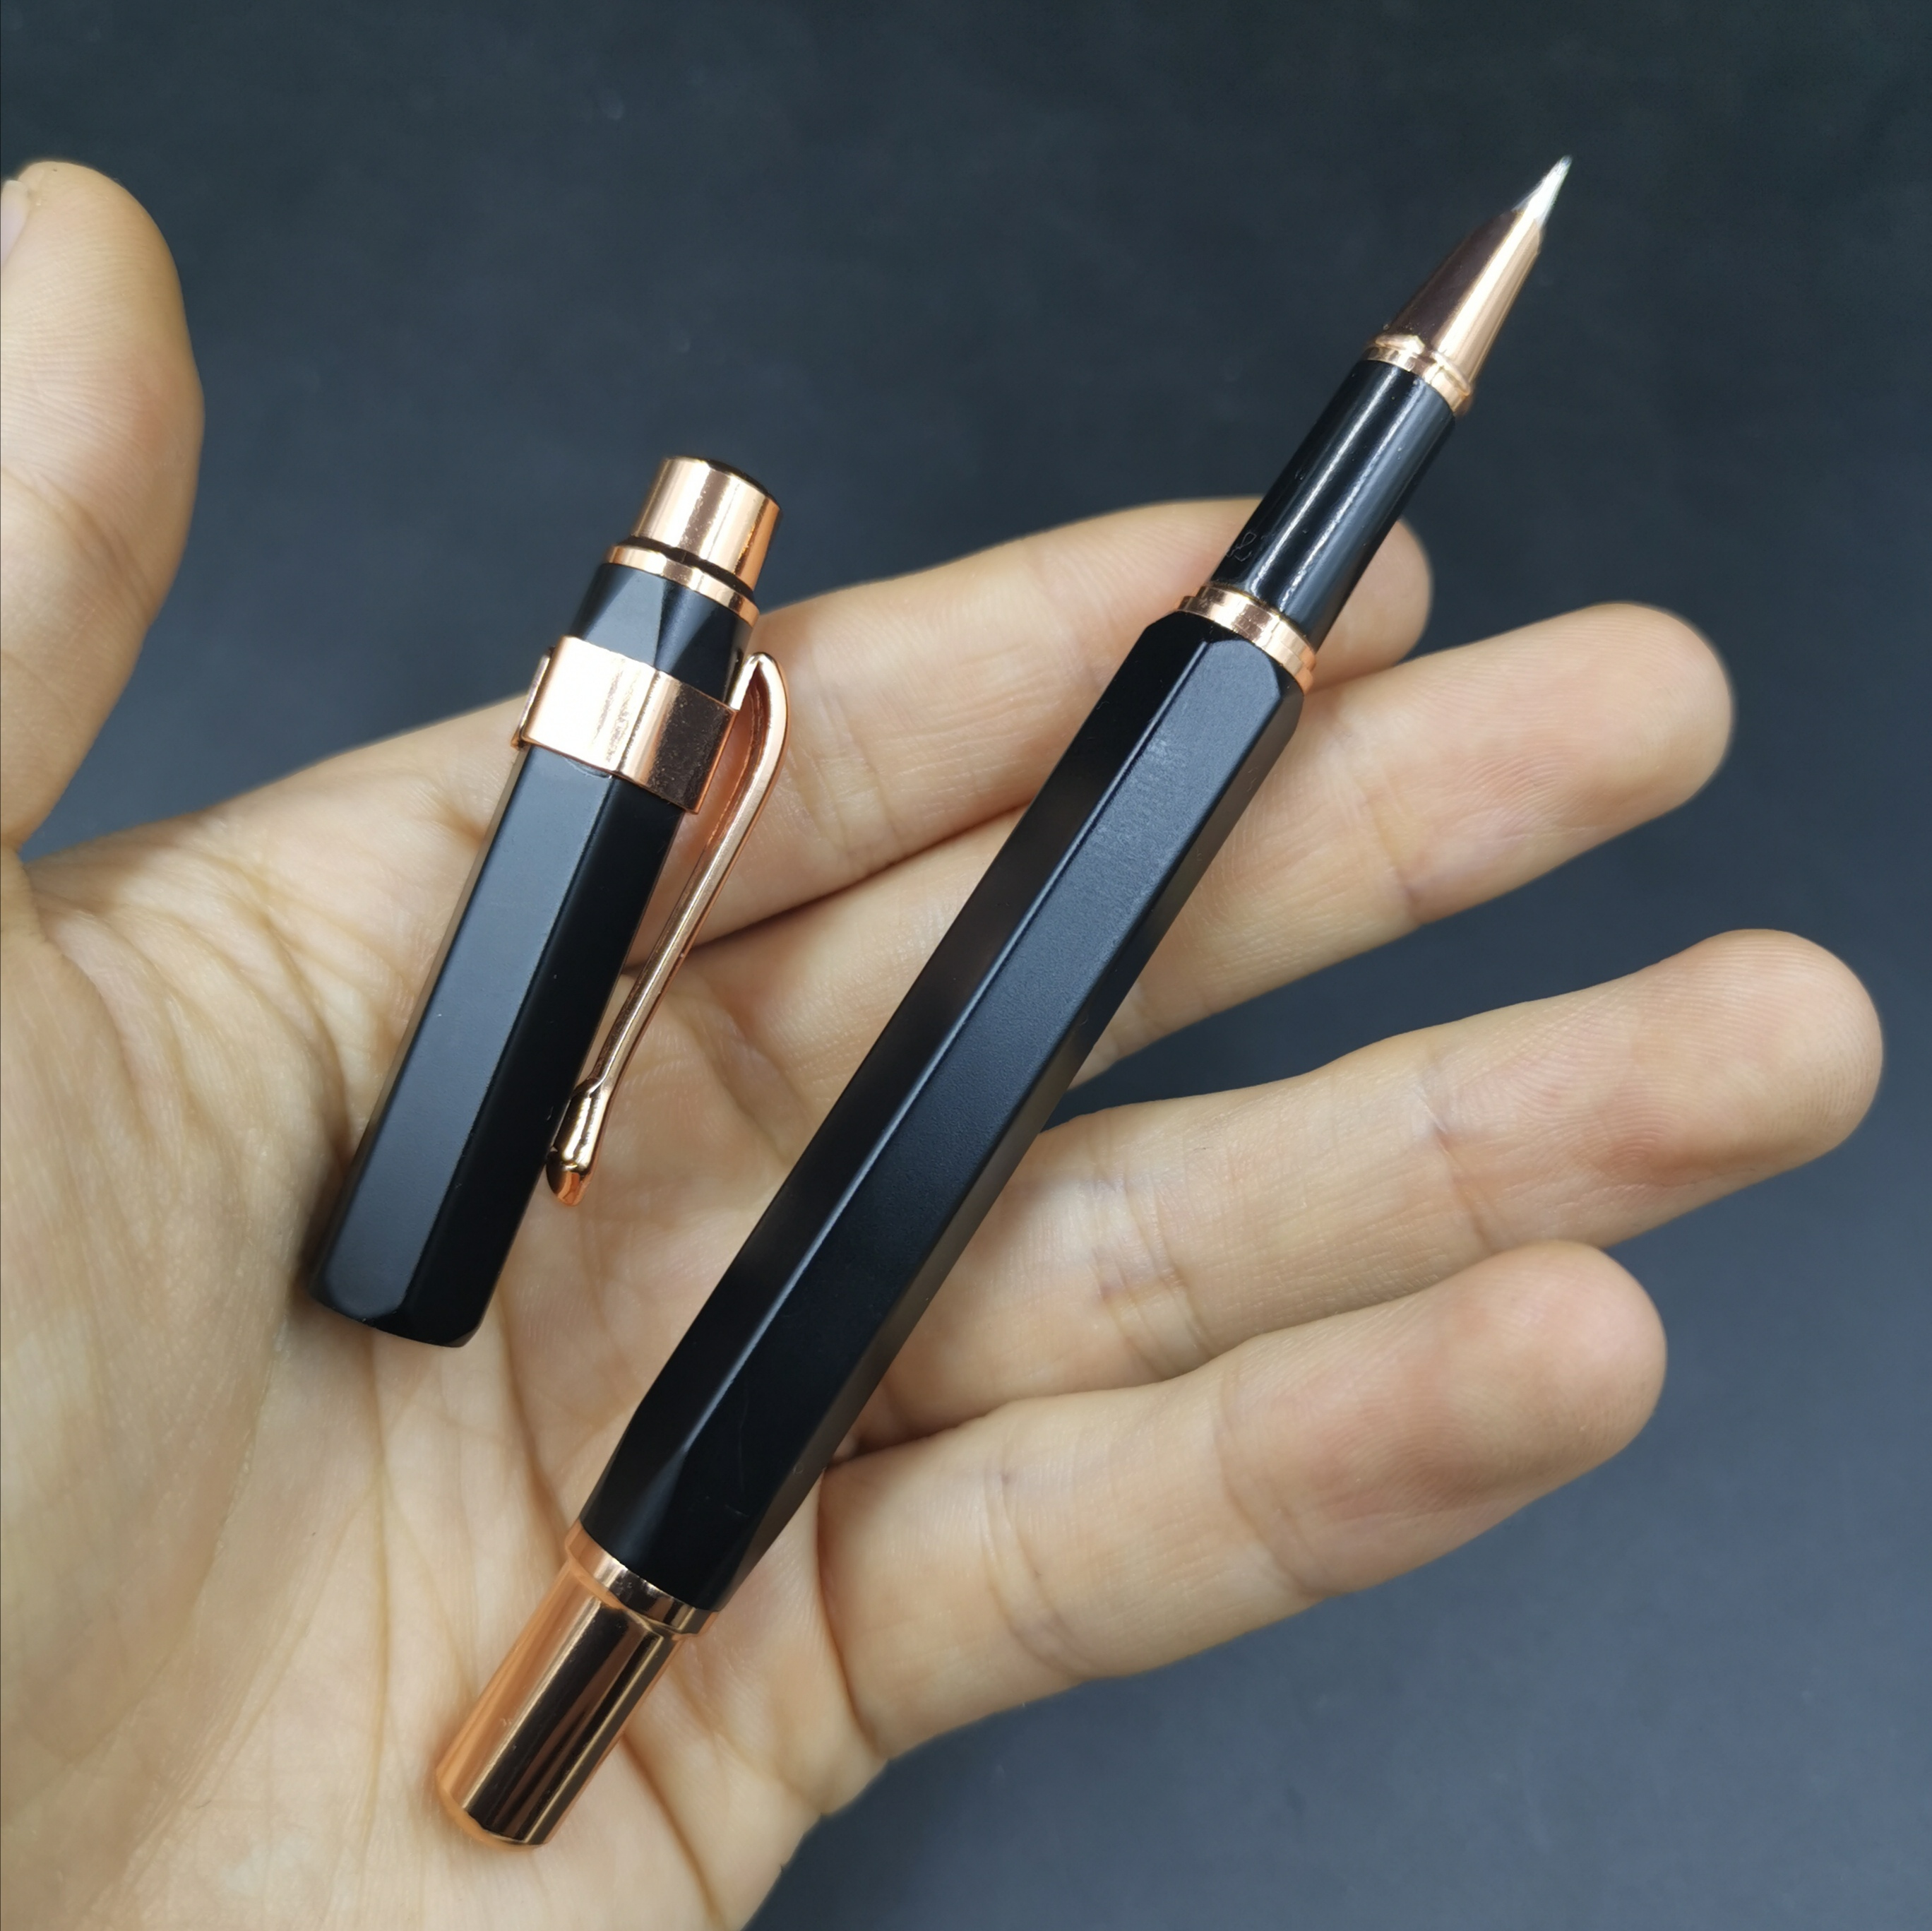 Rare Old Stock Wing Sung 095 Fountain Pen Hexagon Ink Pen F Nib 2015S Stock Stationery Office School Supplies Penna Stilografica